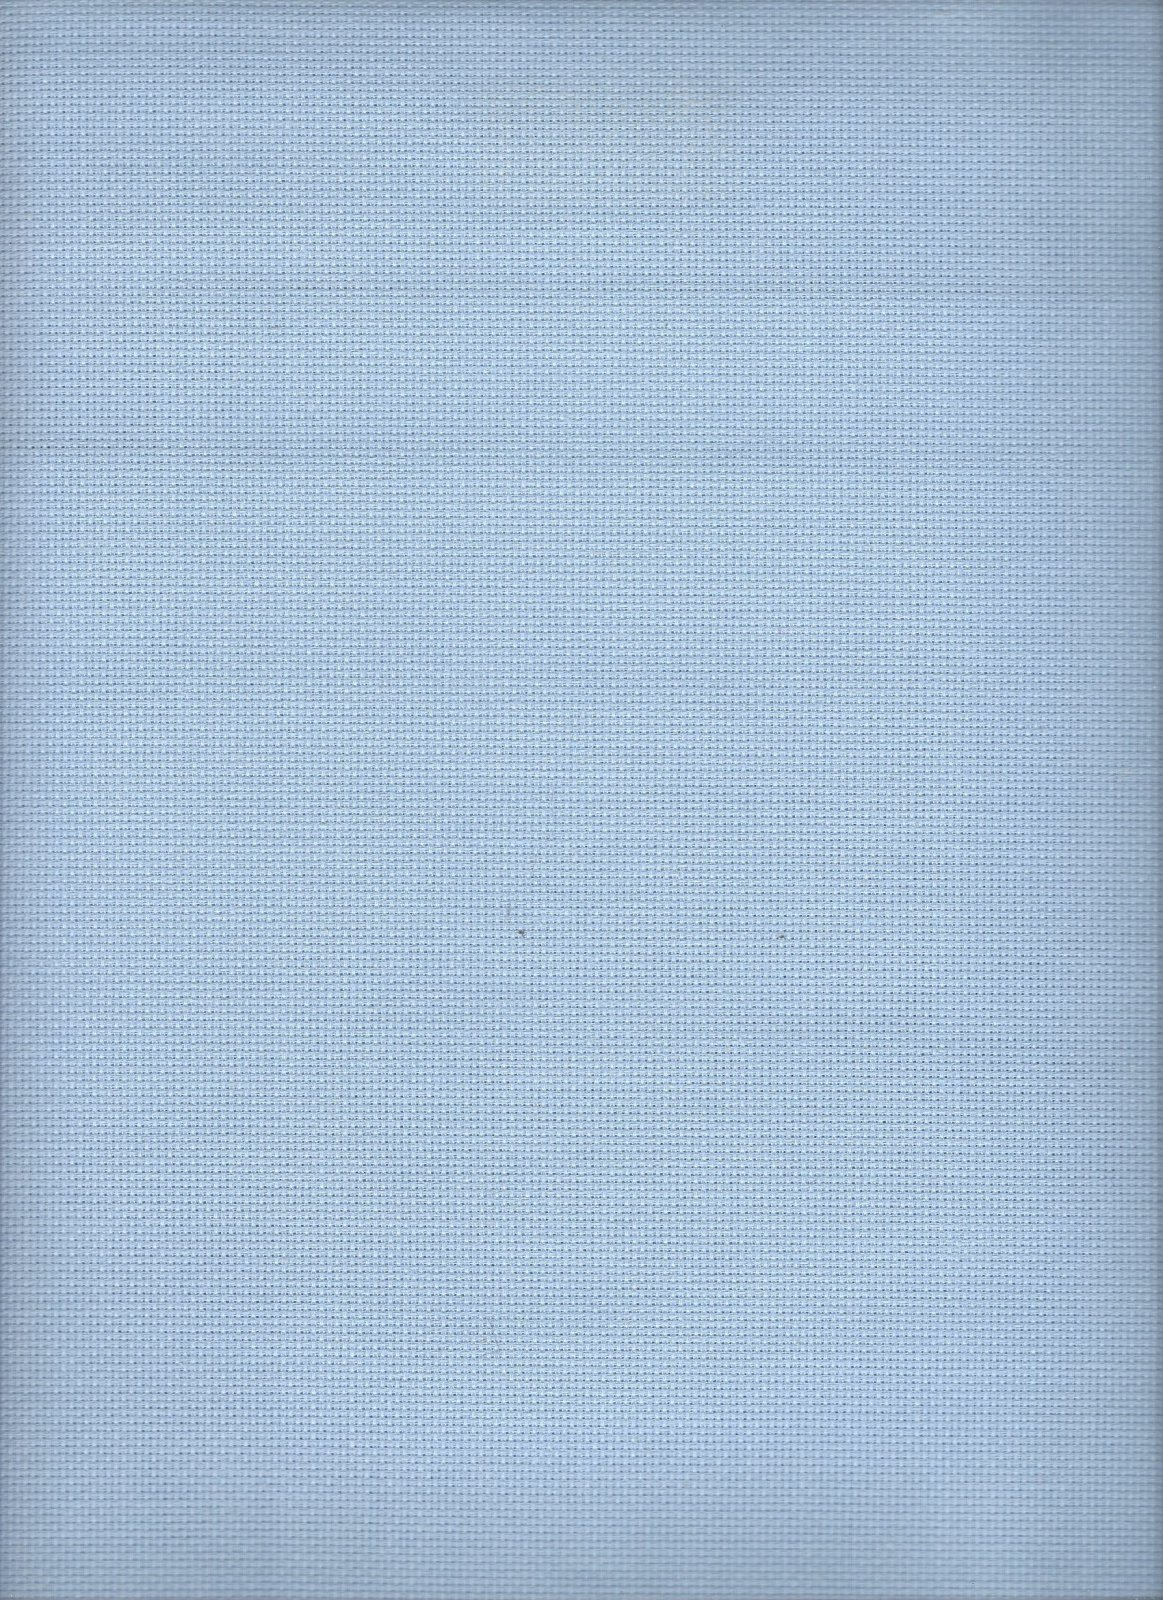 Aida 18ct Light Blue